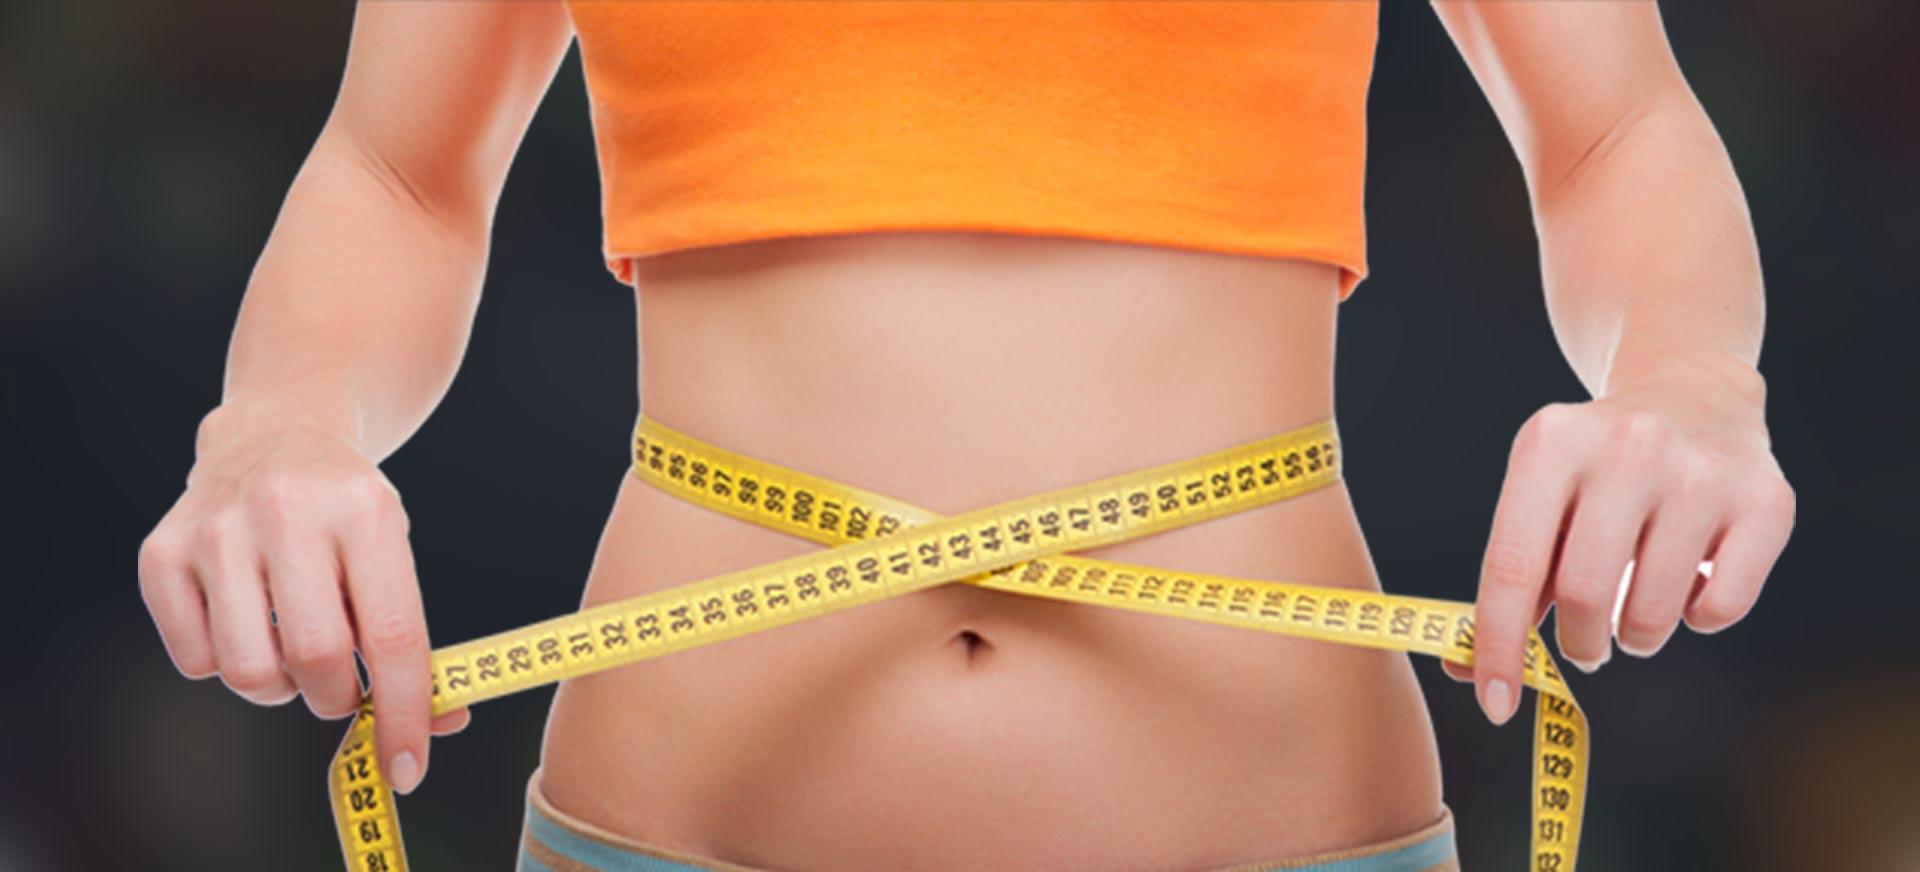 Is Vaser Liposuction A Smart Body Contouring Procedure?